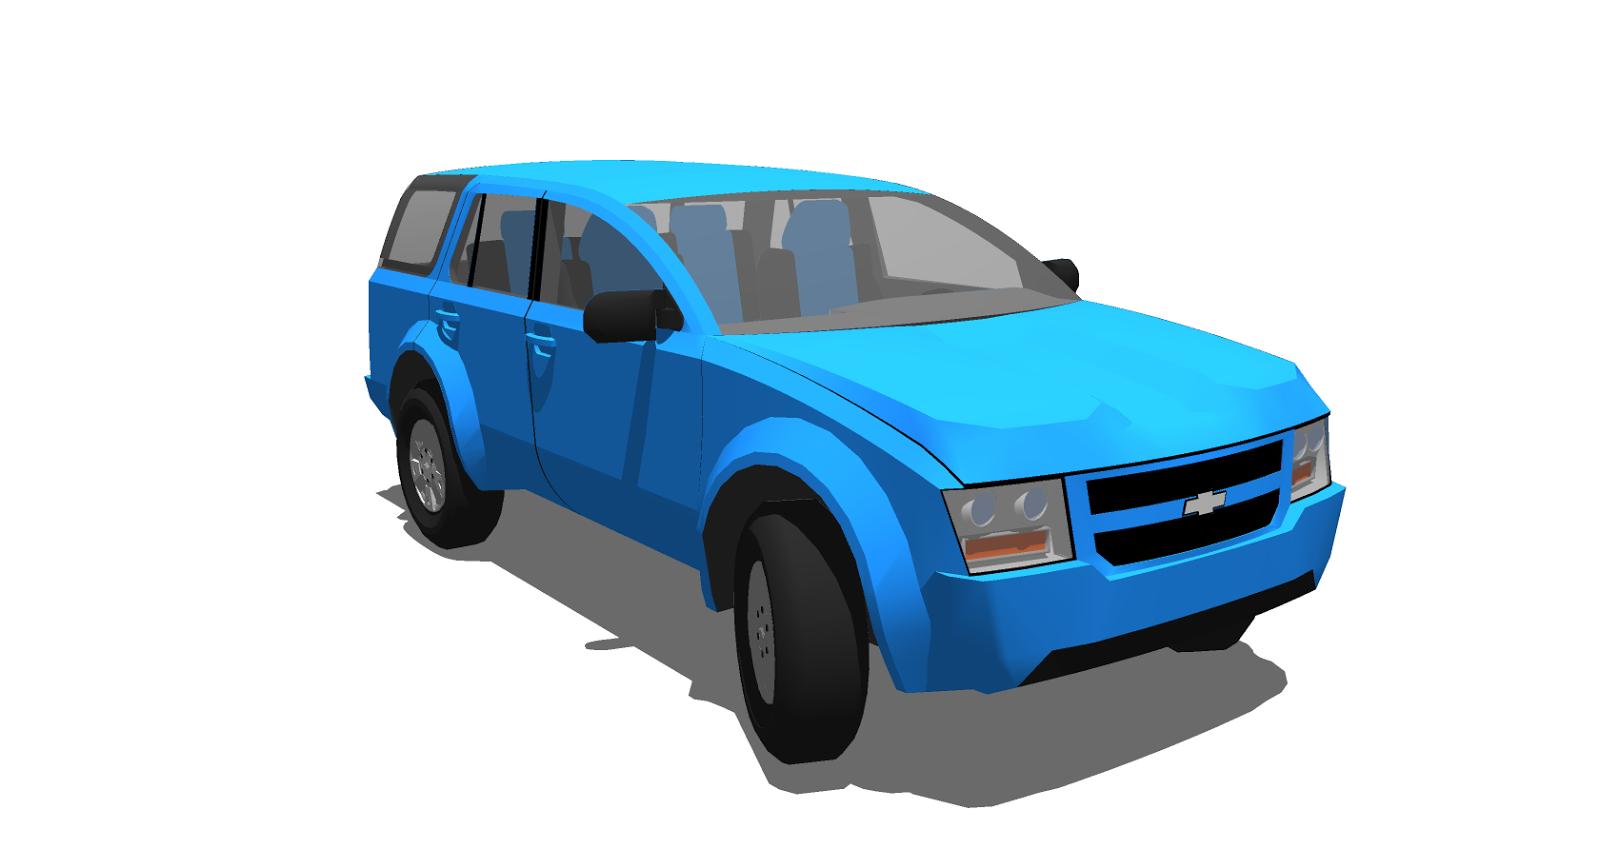 2015 Chevy Blazer Concept